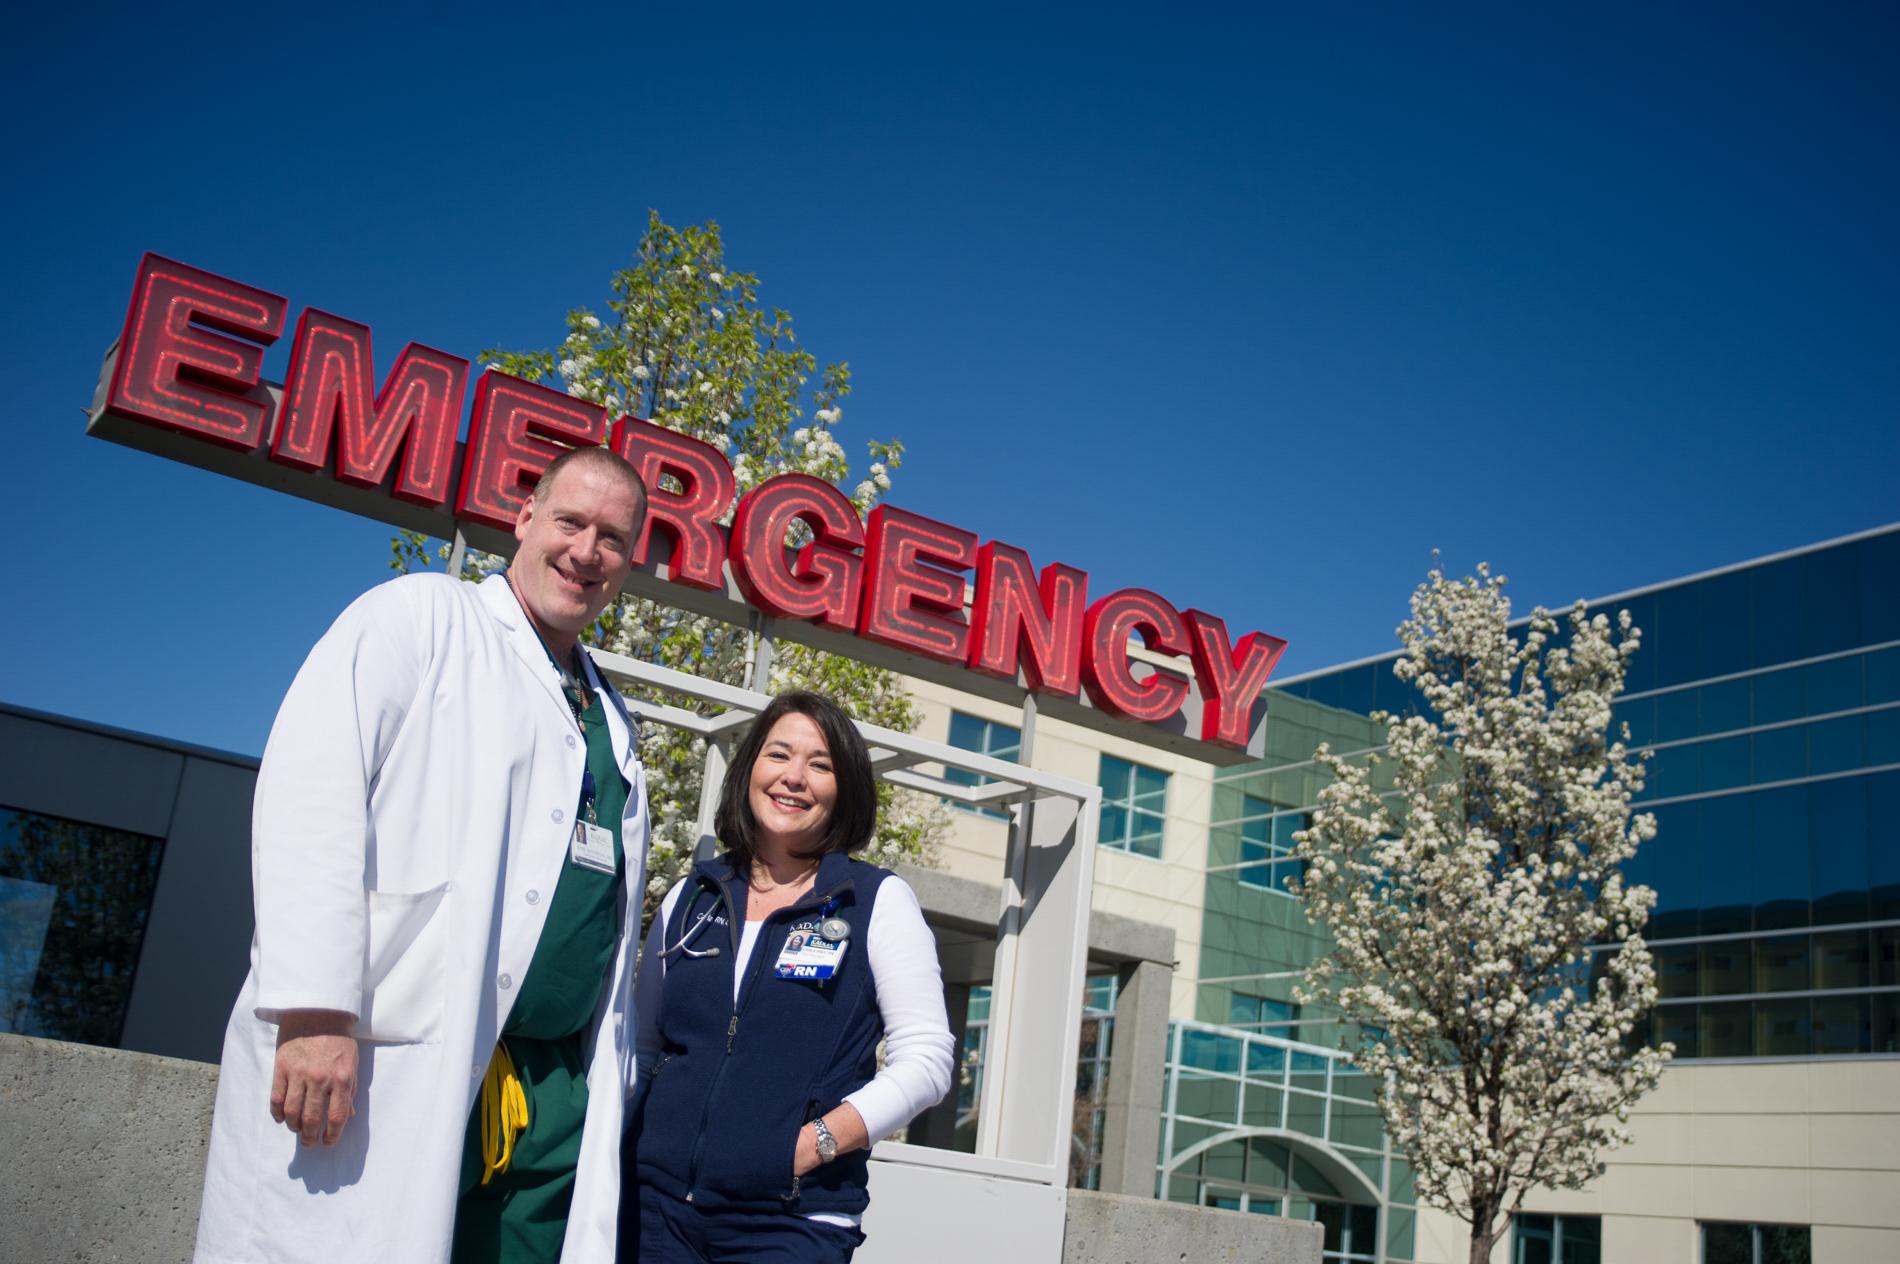 Emergency Photography